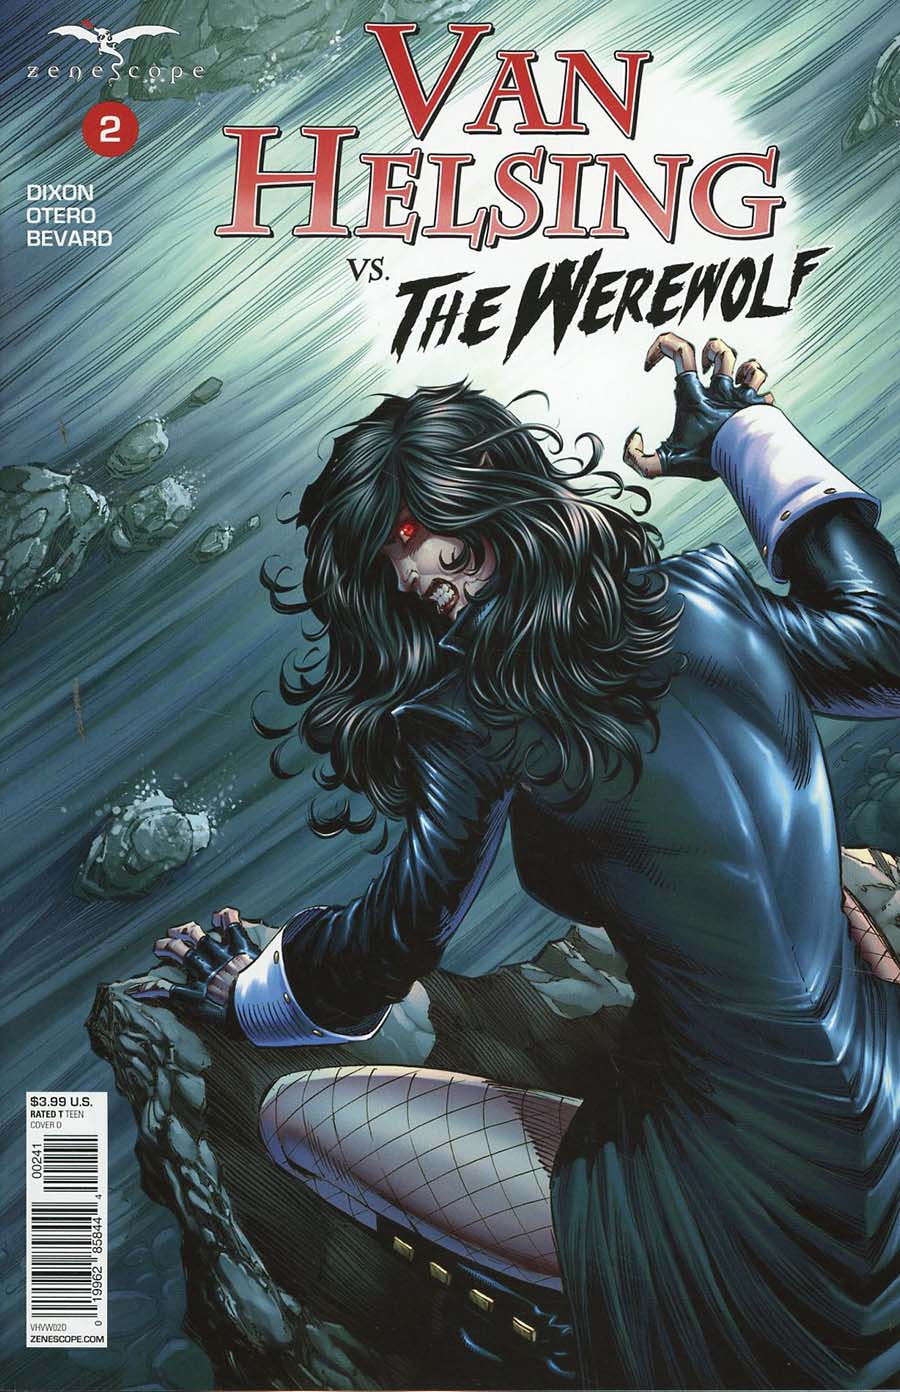 Grimm Fairy Tales Presents Van Helsing vs The Werewolf #2 Cover D Jason Metcalf